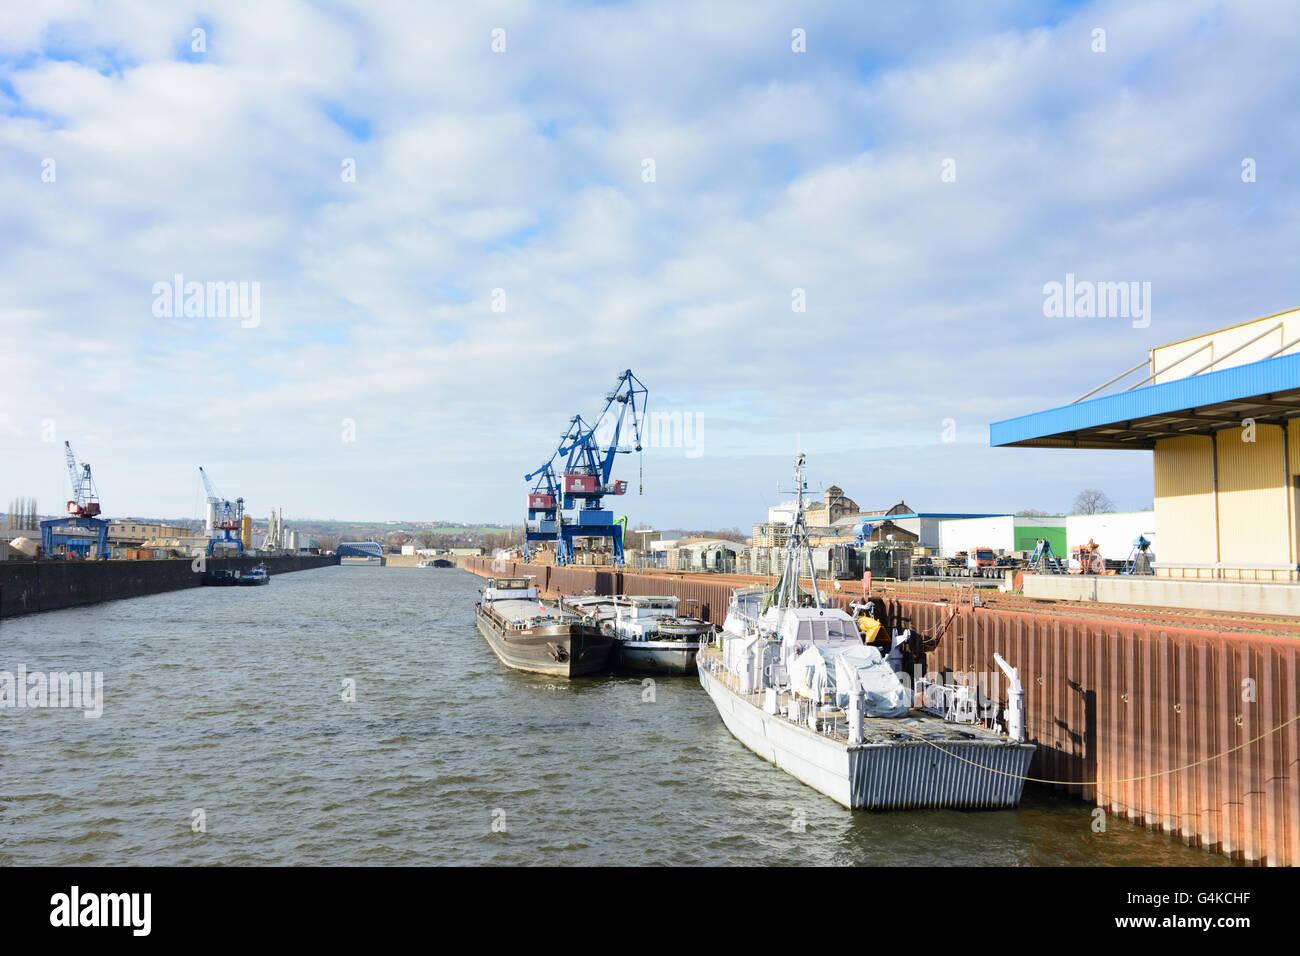 Harbour Dresden : Museum ship inland minesweeper ' Atlantis ', Germany, Sachsen, Saxony, , Dresden - Stock Image